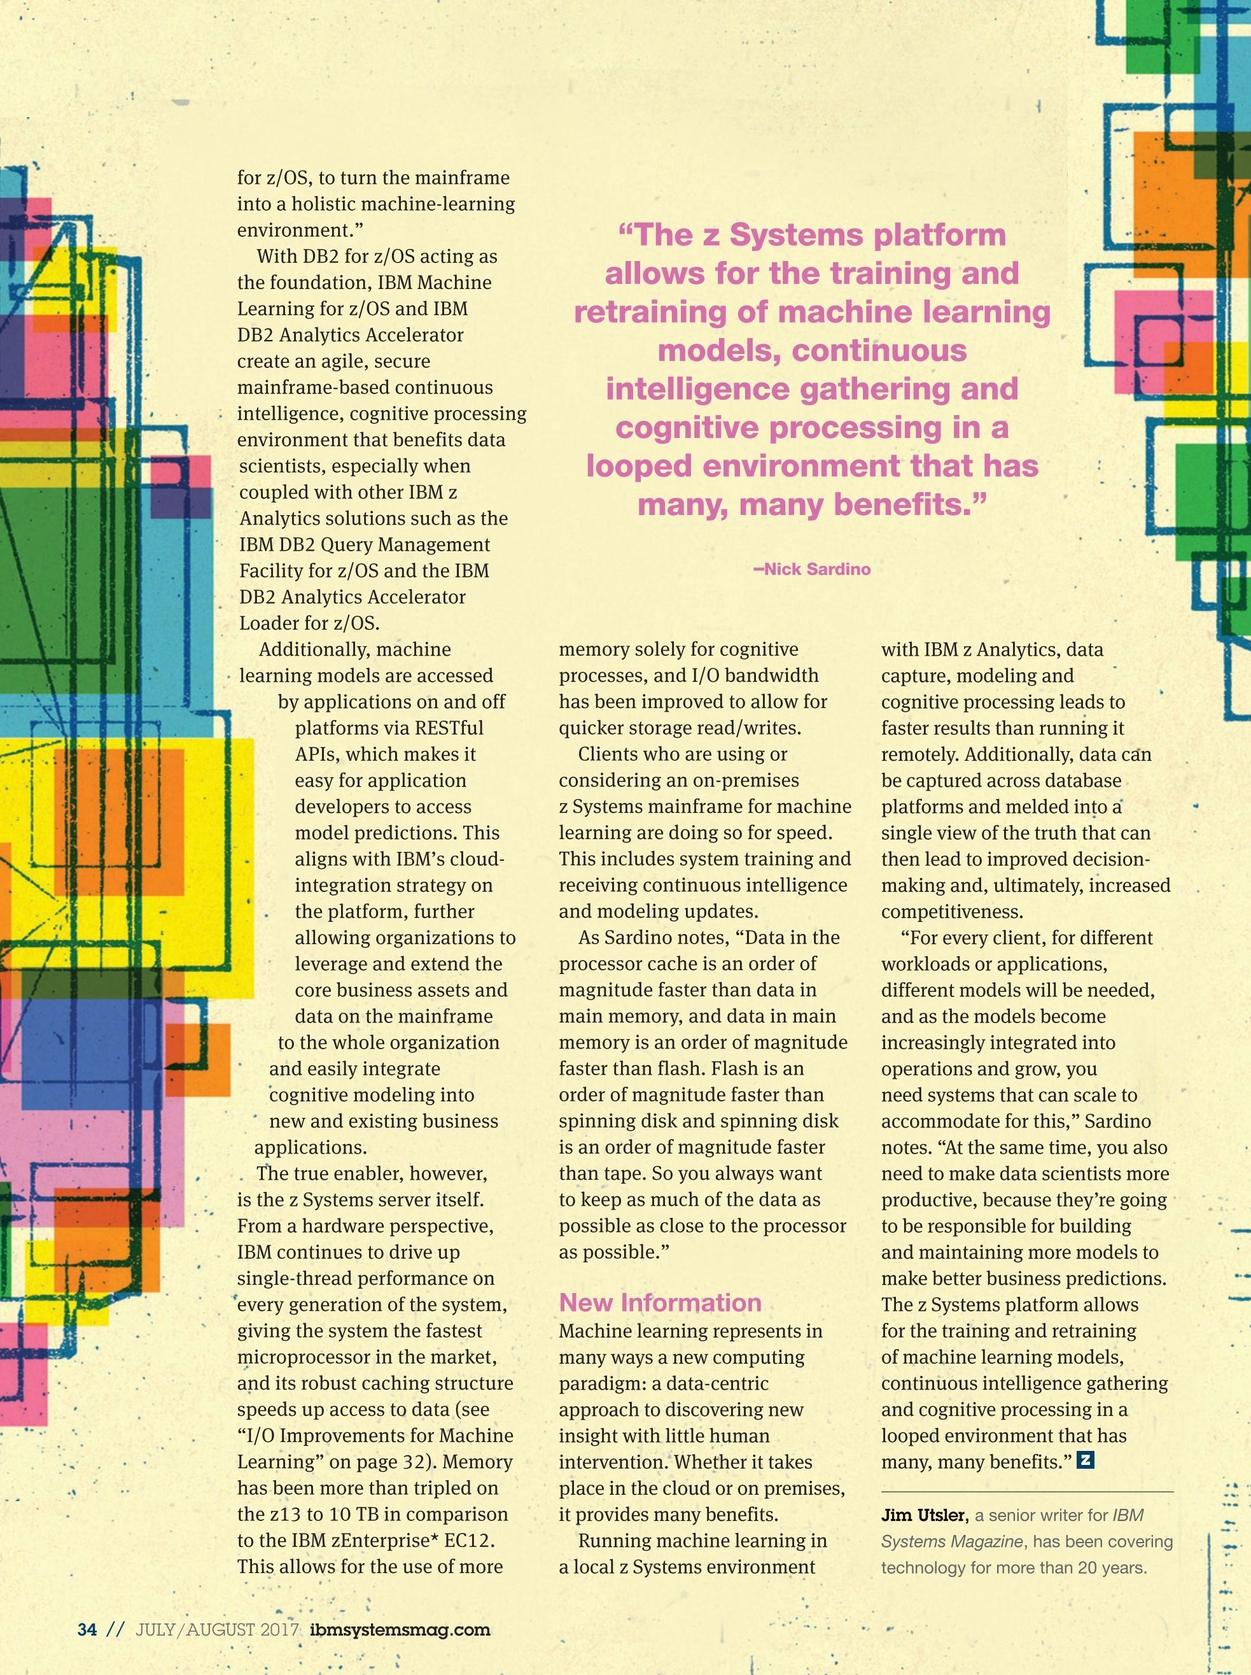 IBM Systems Magazine, Mainframe - July/August 2017